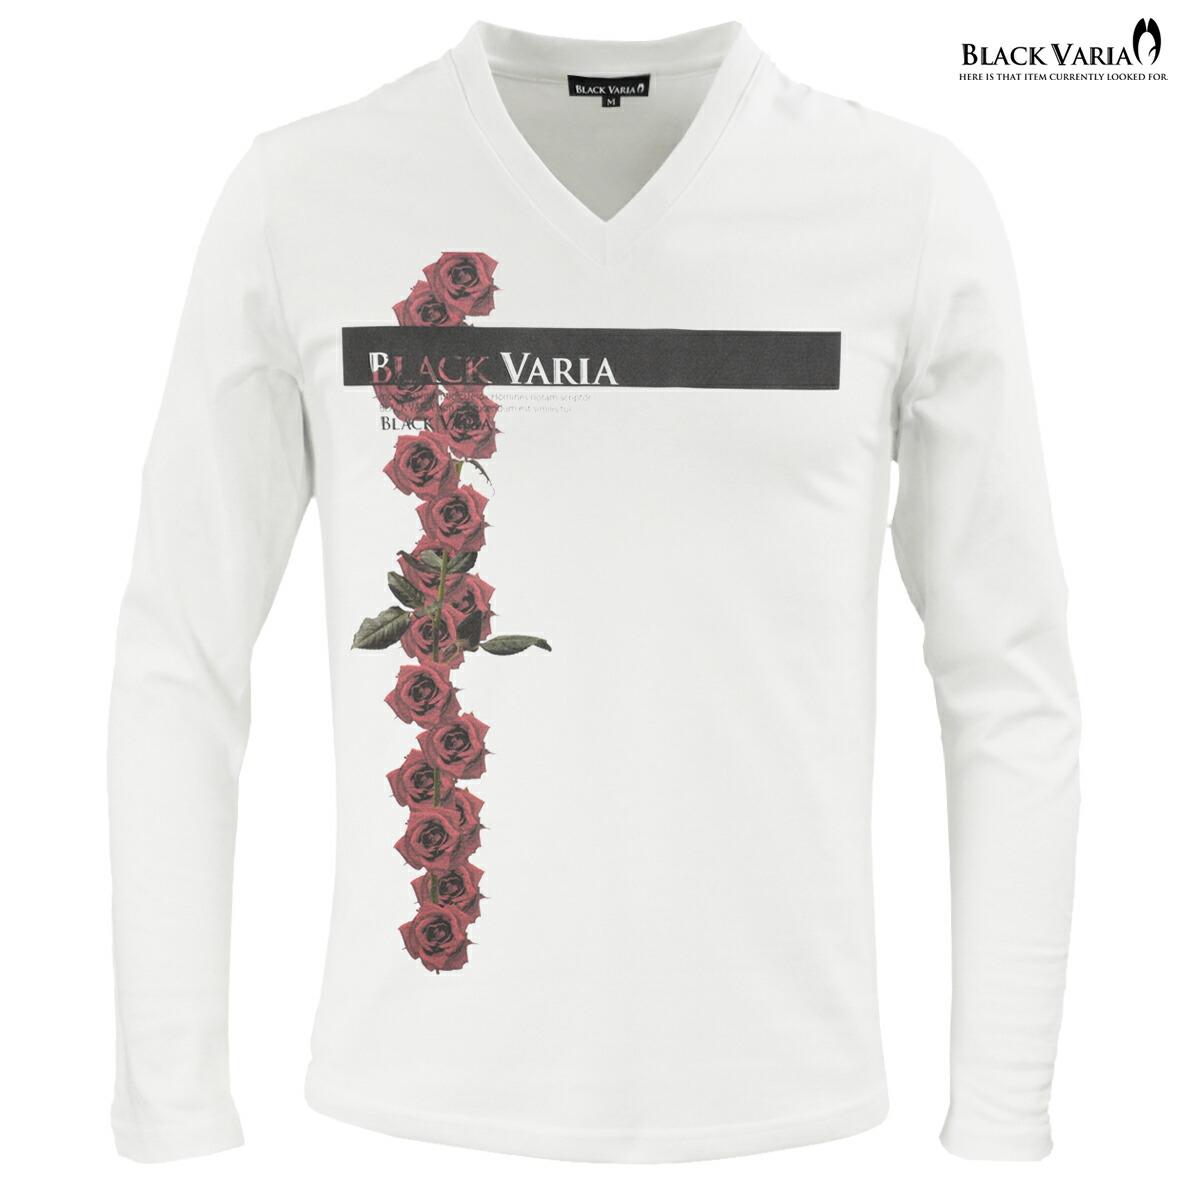 Tシャツ 長袖 ボックスロゴ バラ 花柄 薔薇 Vネック メンズ(ホワイト白)